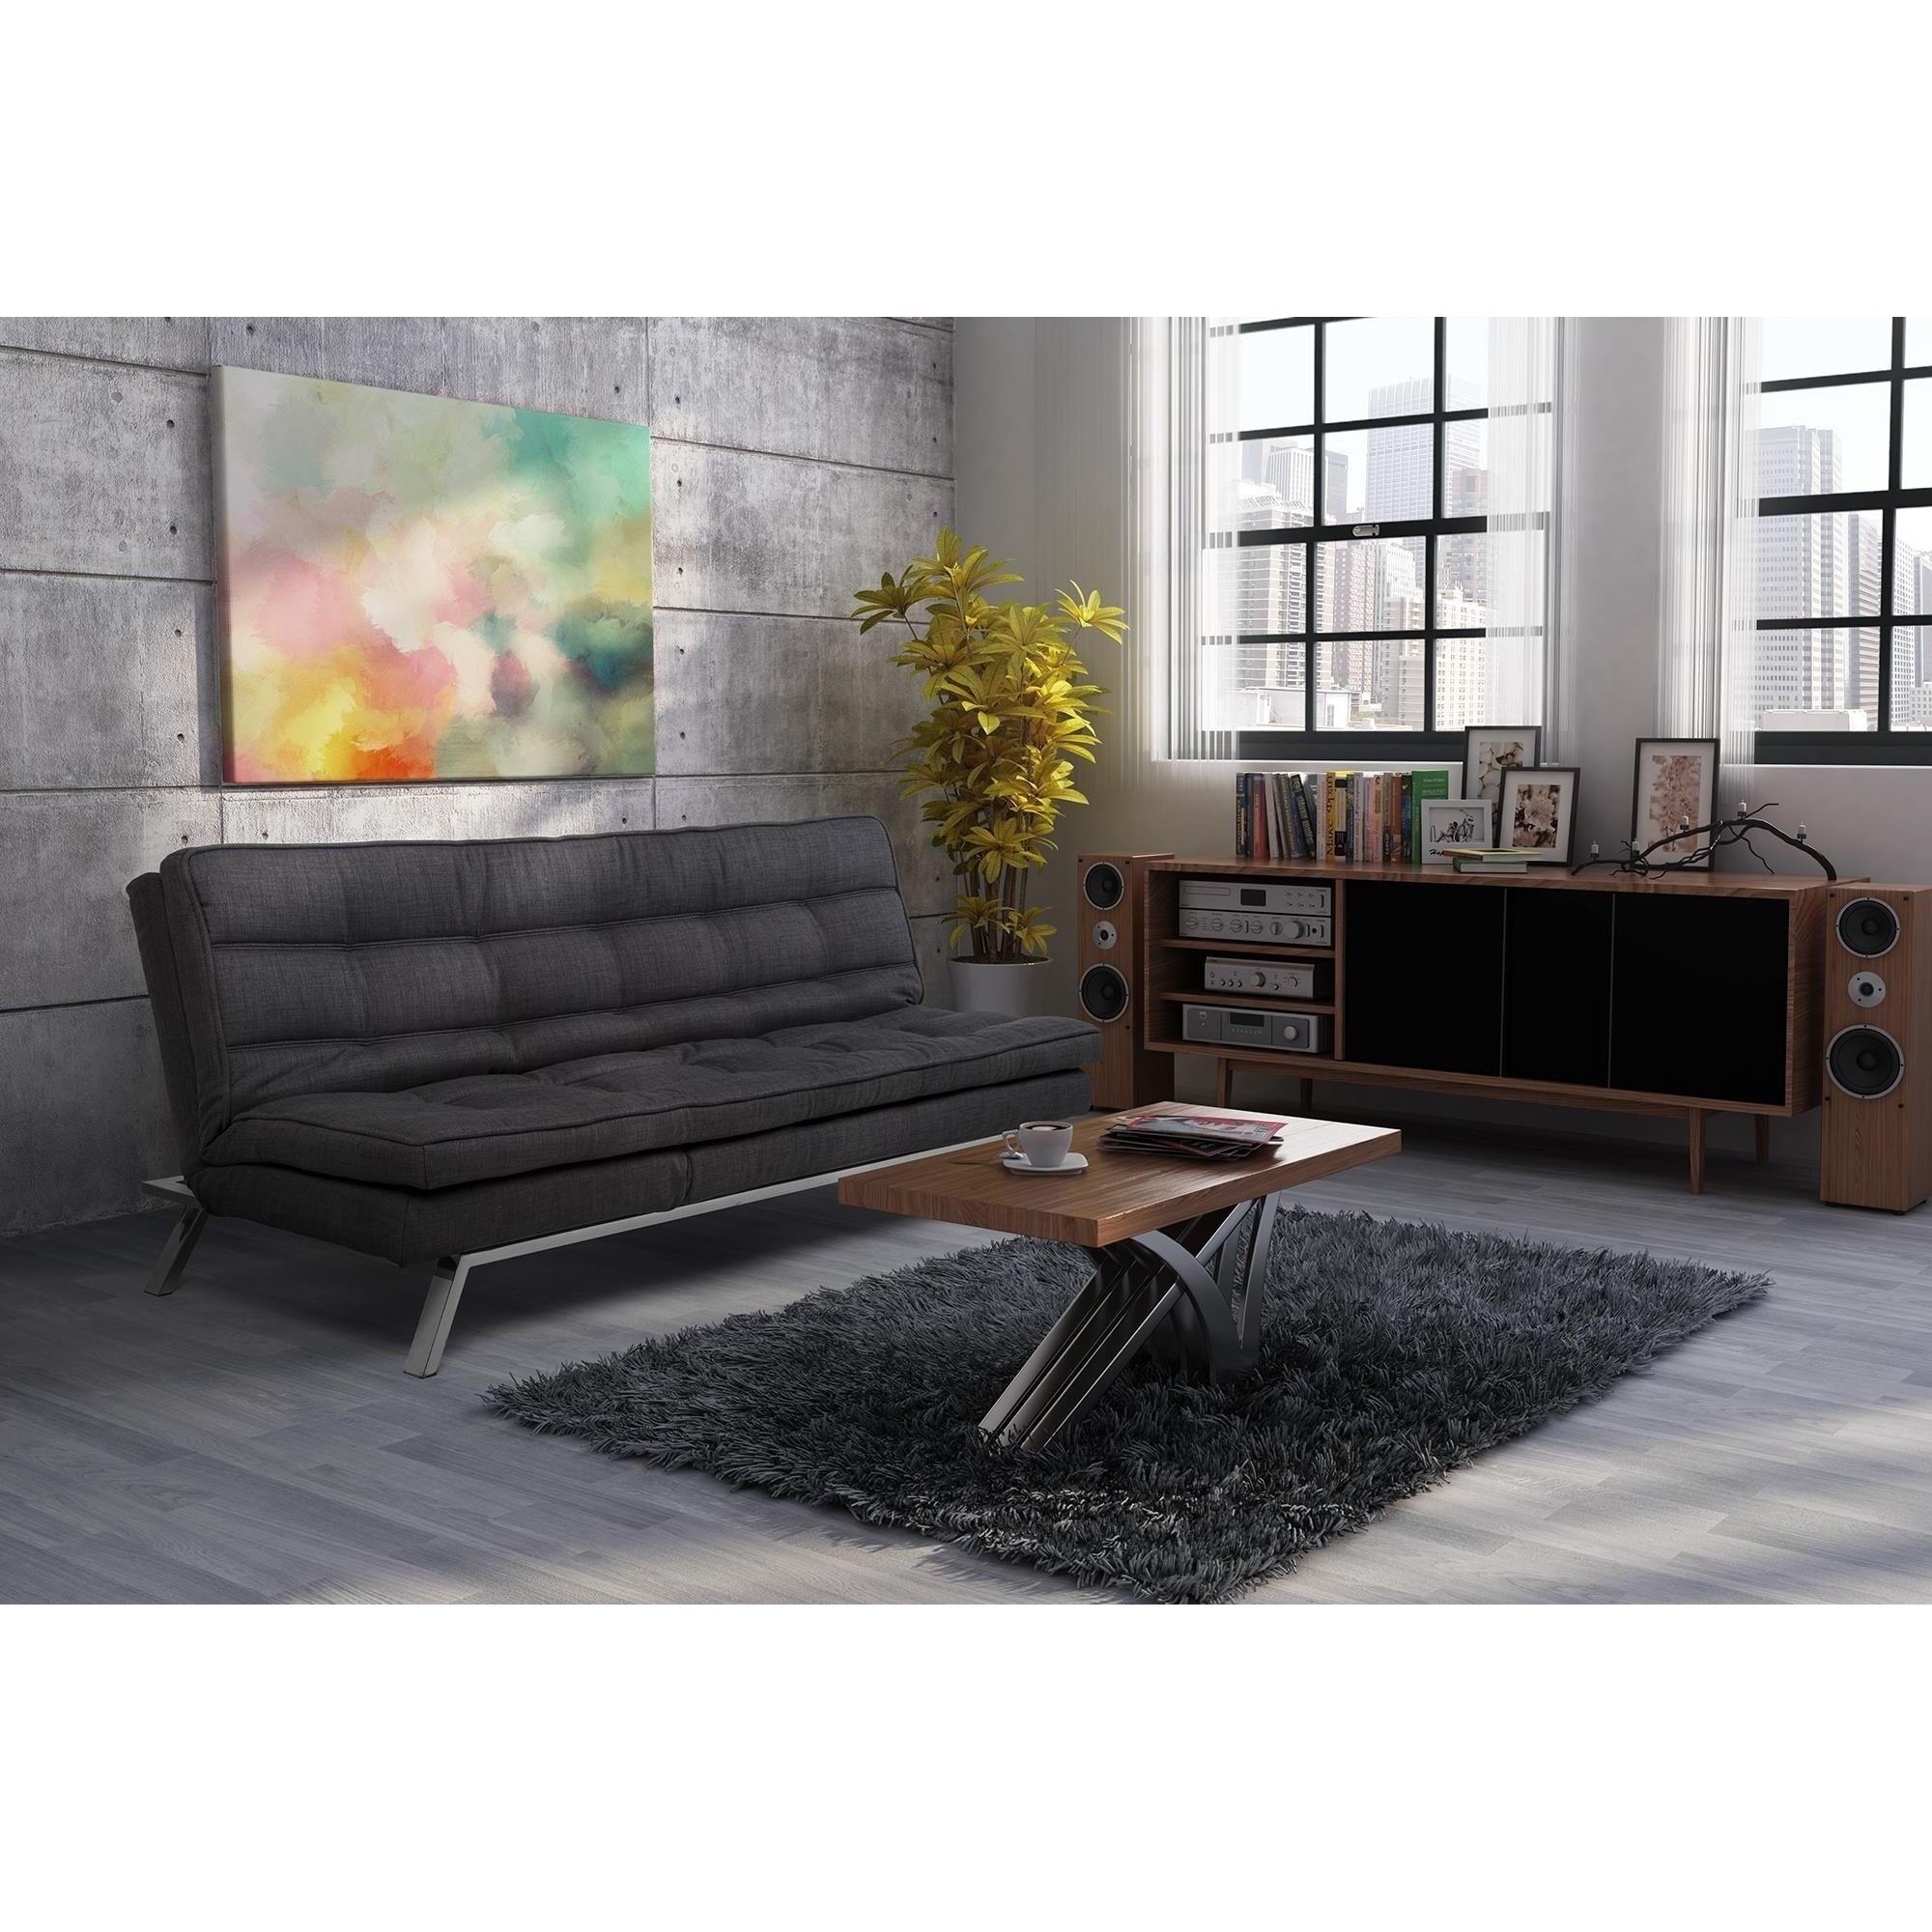 madison beds wi futon furnititure mattress modern futons sofa vs bm